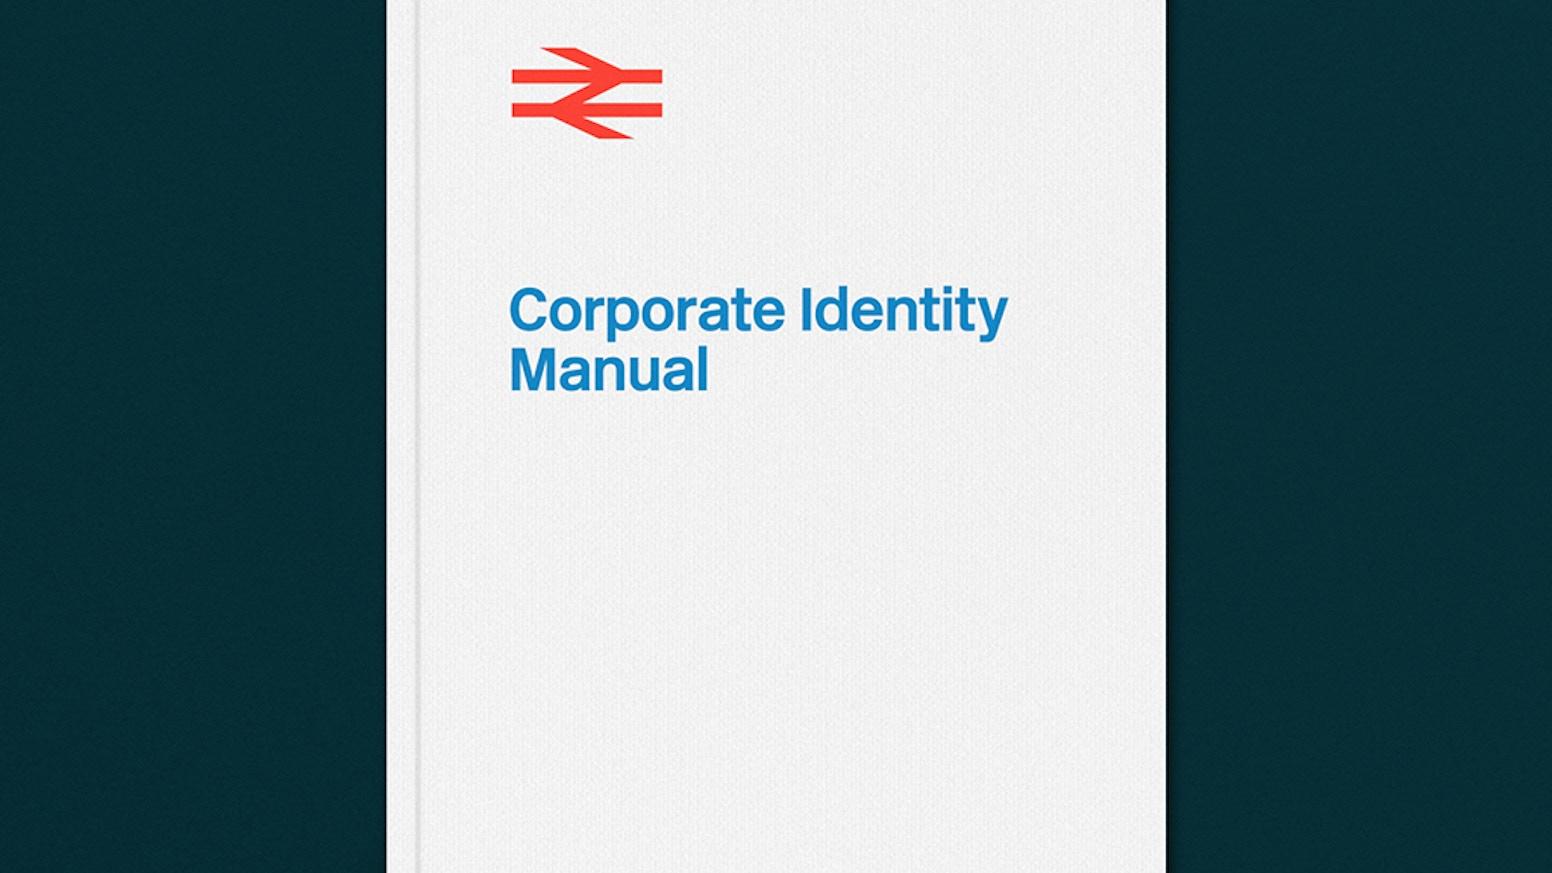 British rail corporate identity manual by wallace henning british rail corporate identity manual by wallace henning kickstarter biocorpaavc Images